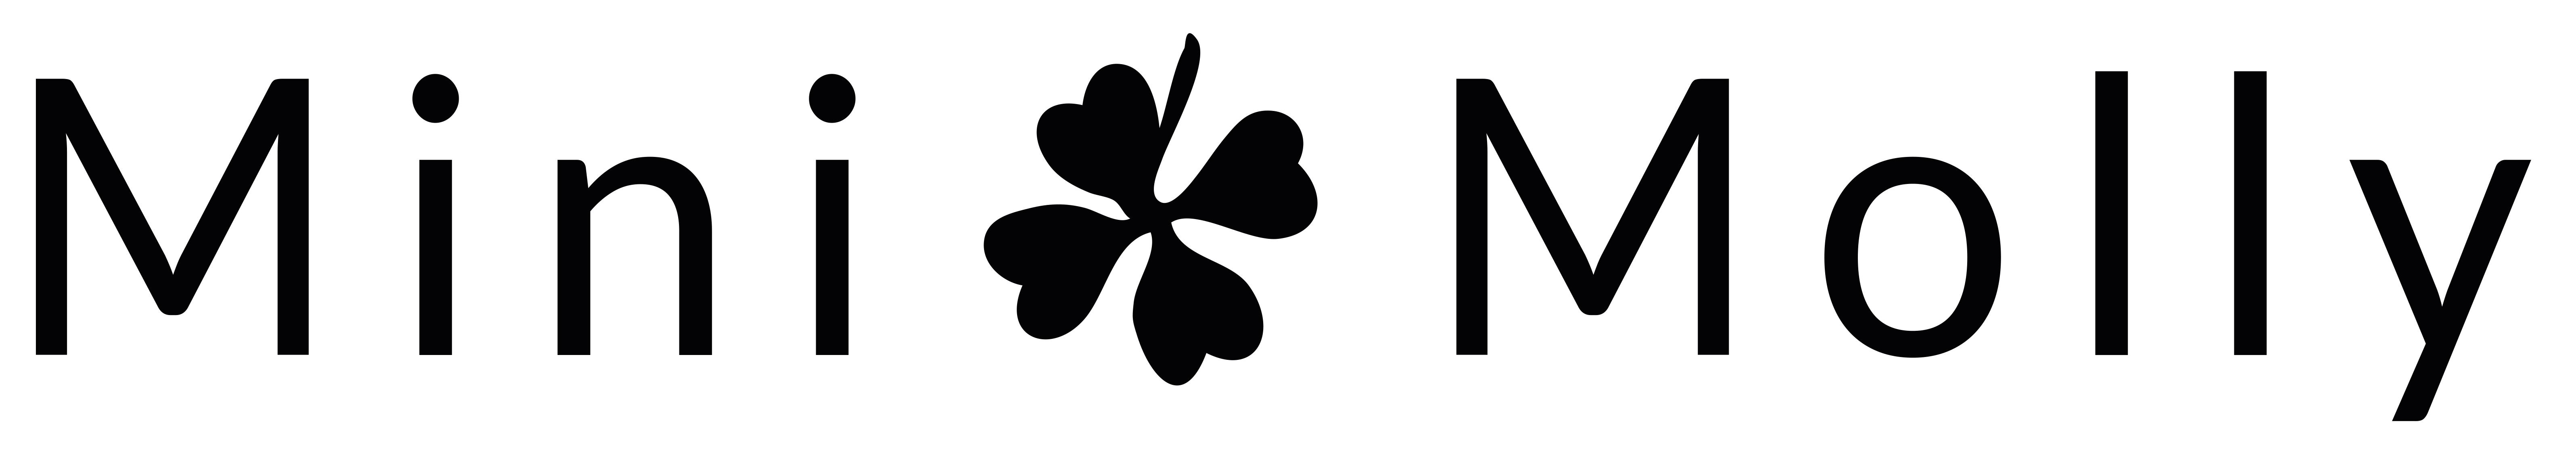 Logos mini molly